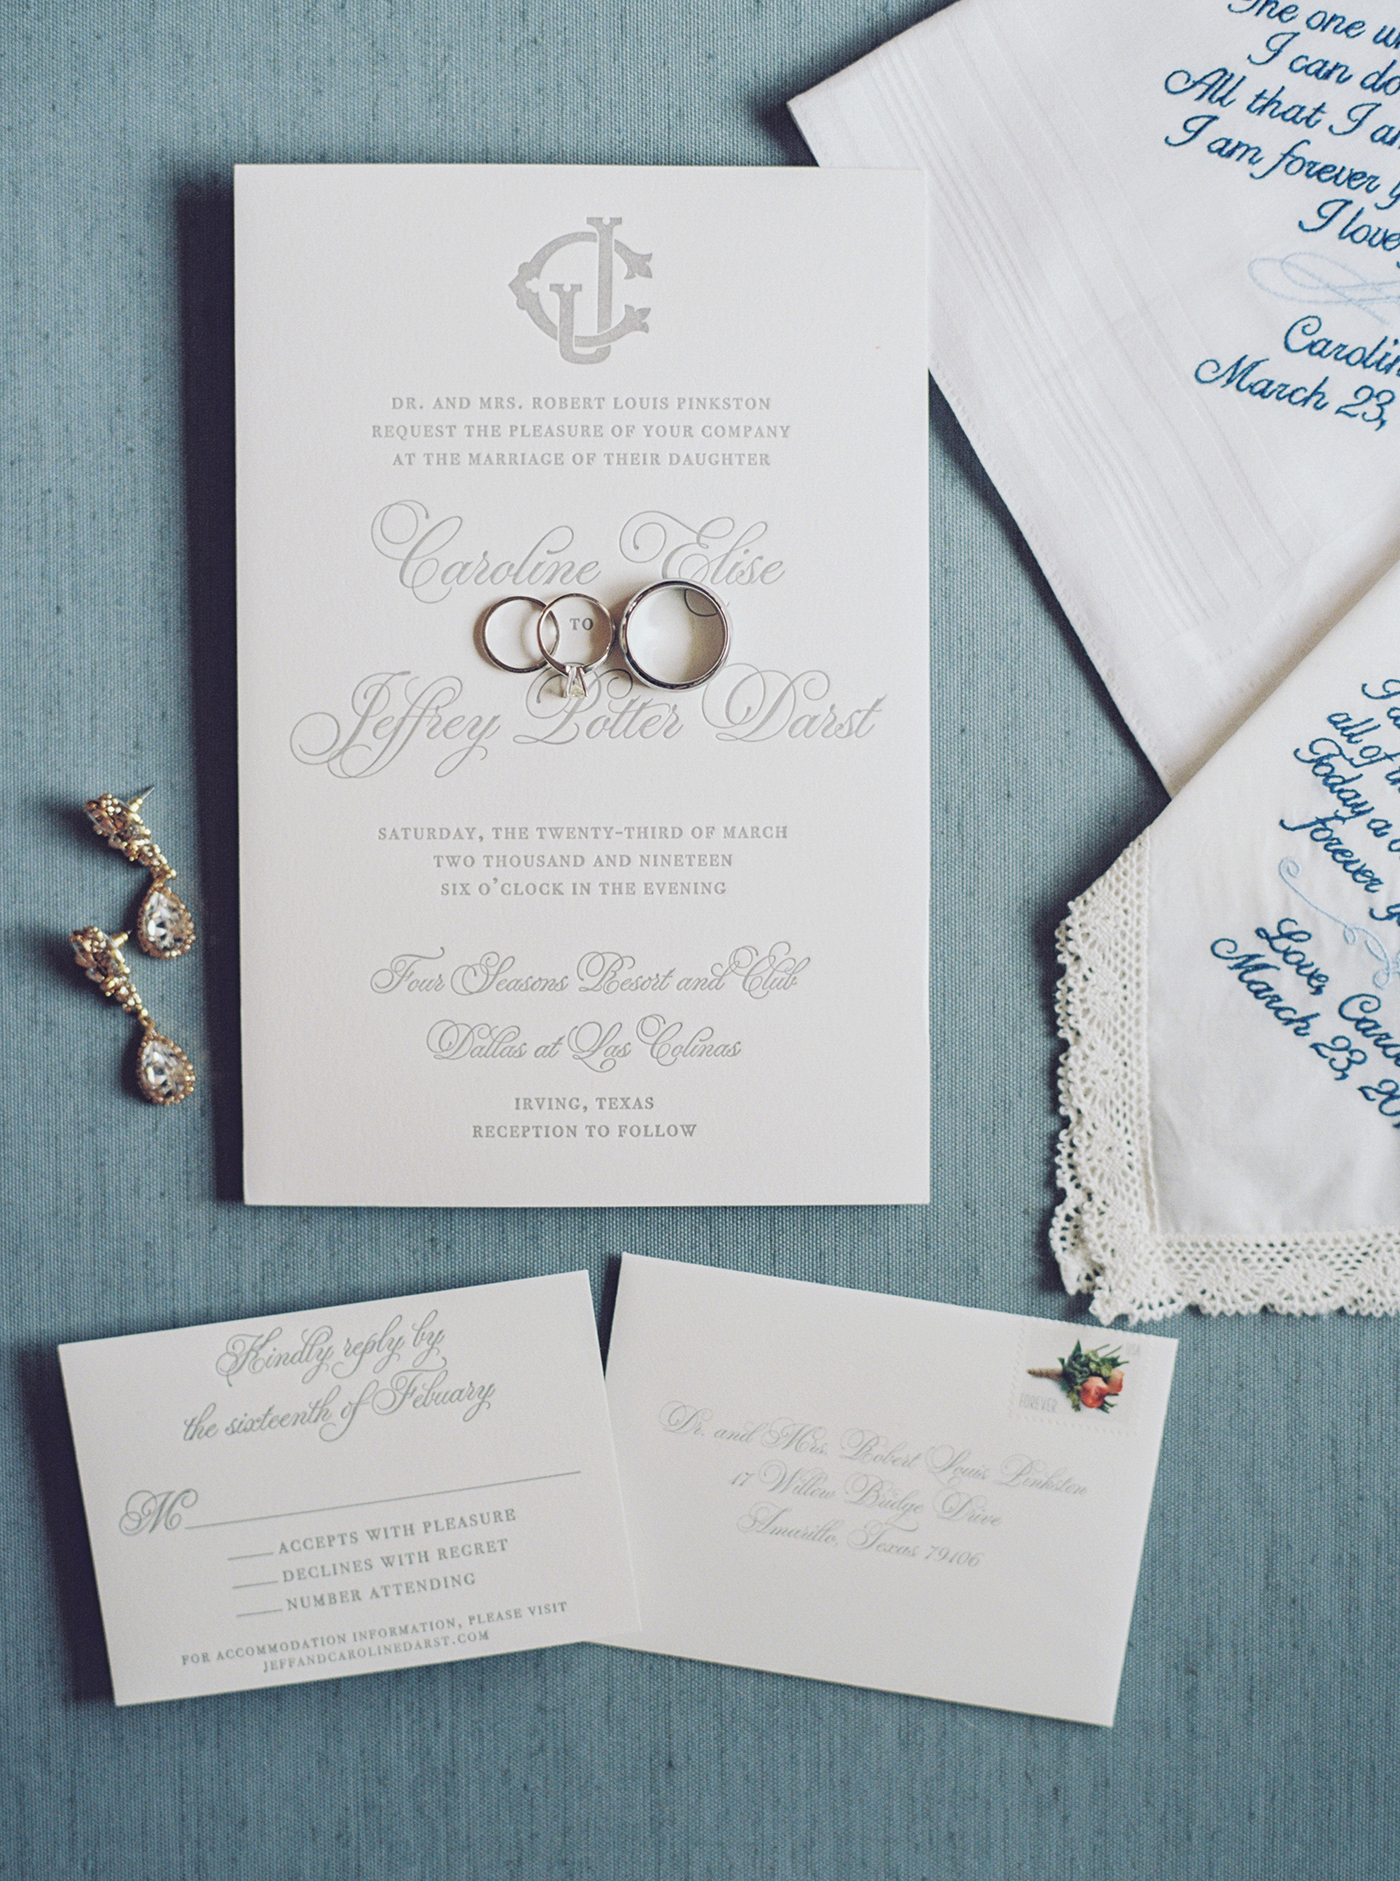 DFW Wedding Planner - Caroline + Jeff at The Four Seasons Hotel Wedding - Allday Events - 2.jpg